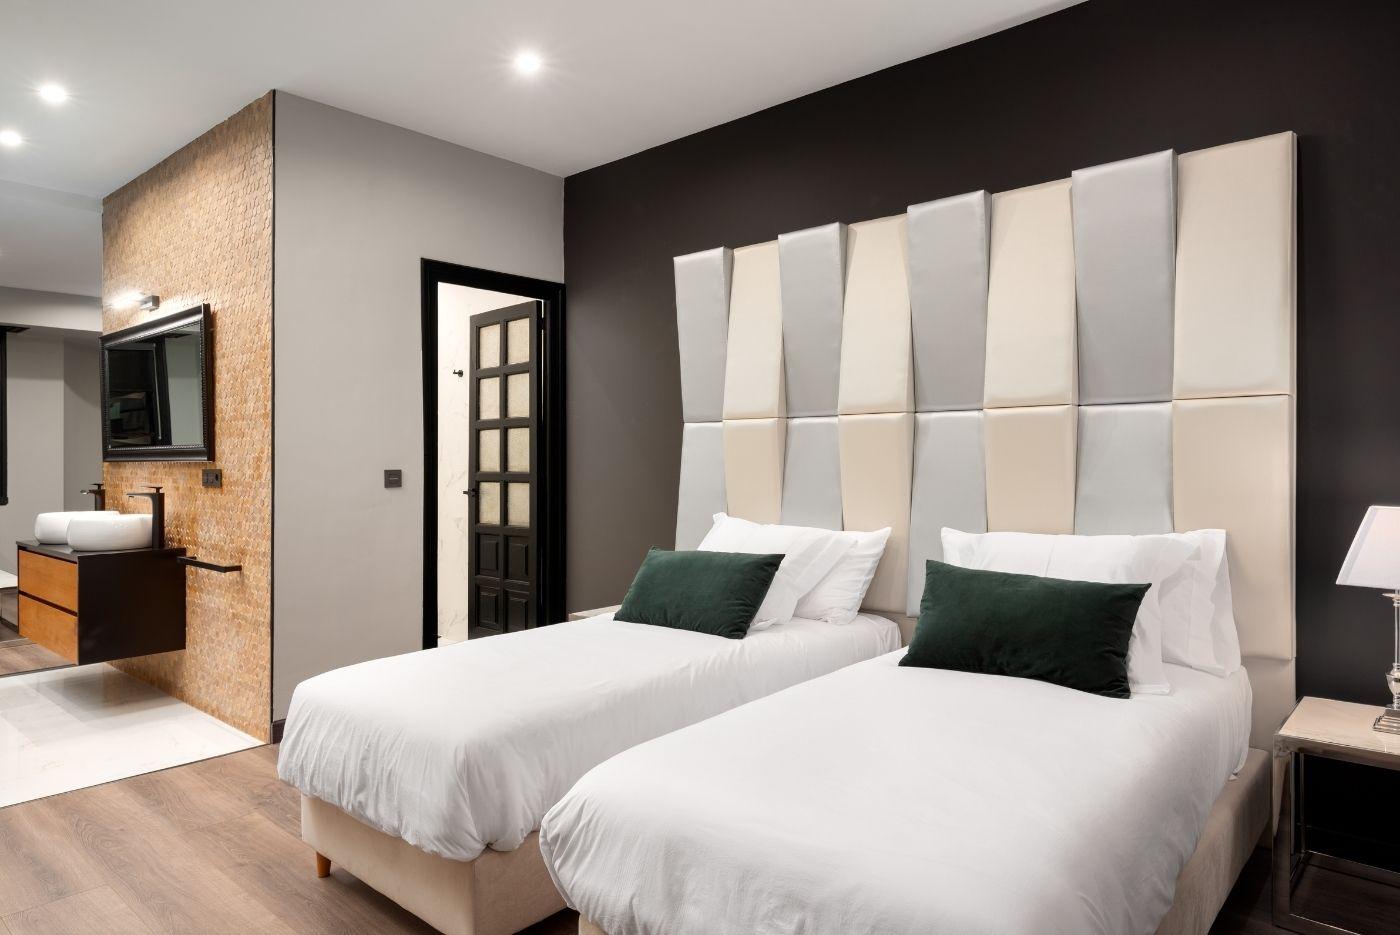 Apartamento-Suite-Deluxe-63-Oviedo-1907-01